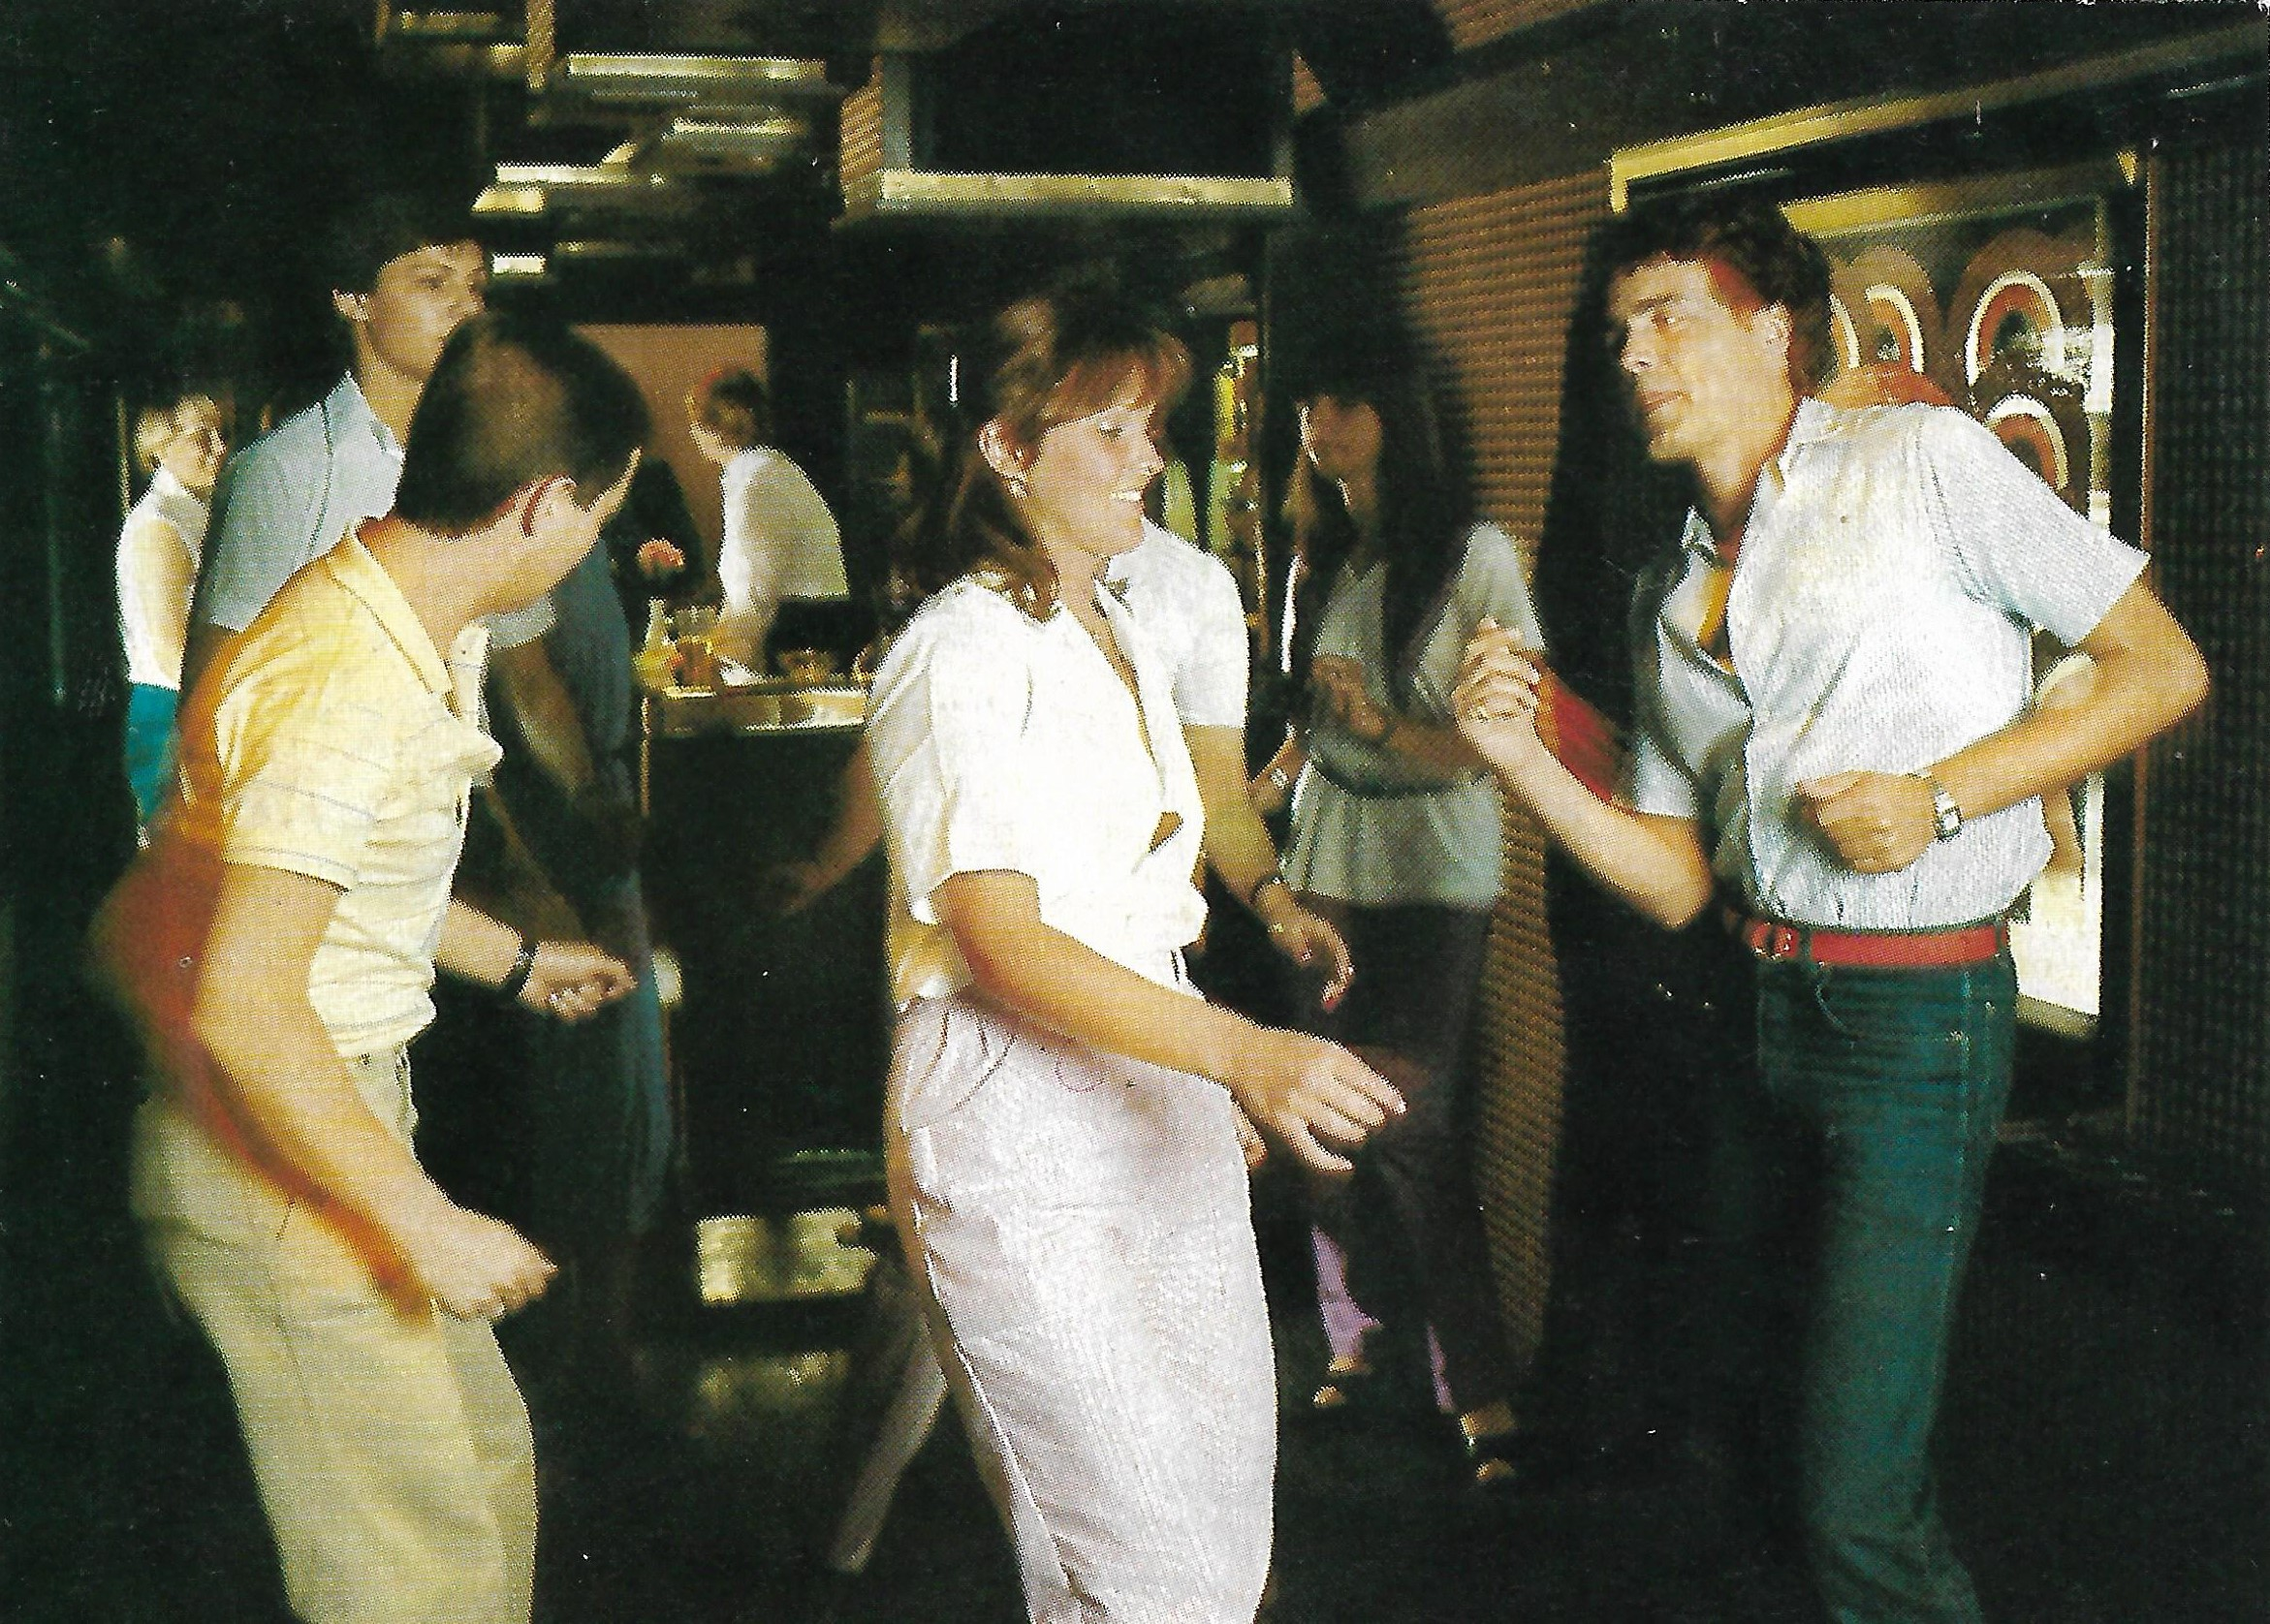 Bar-dancing-Railtour